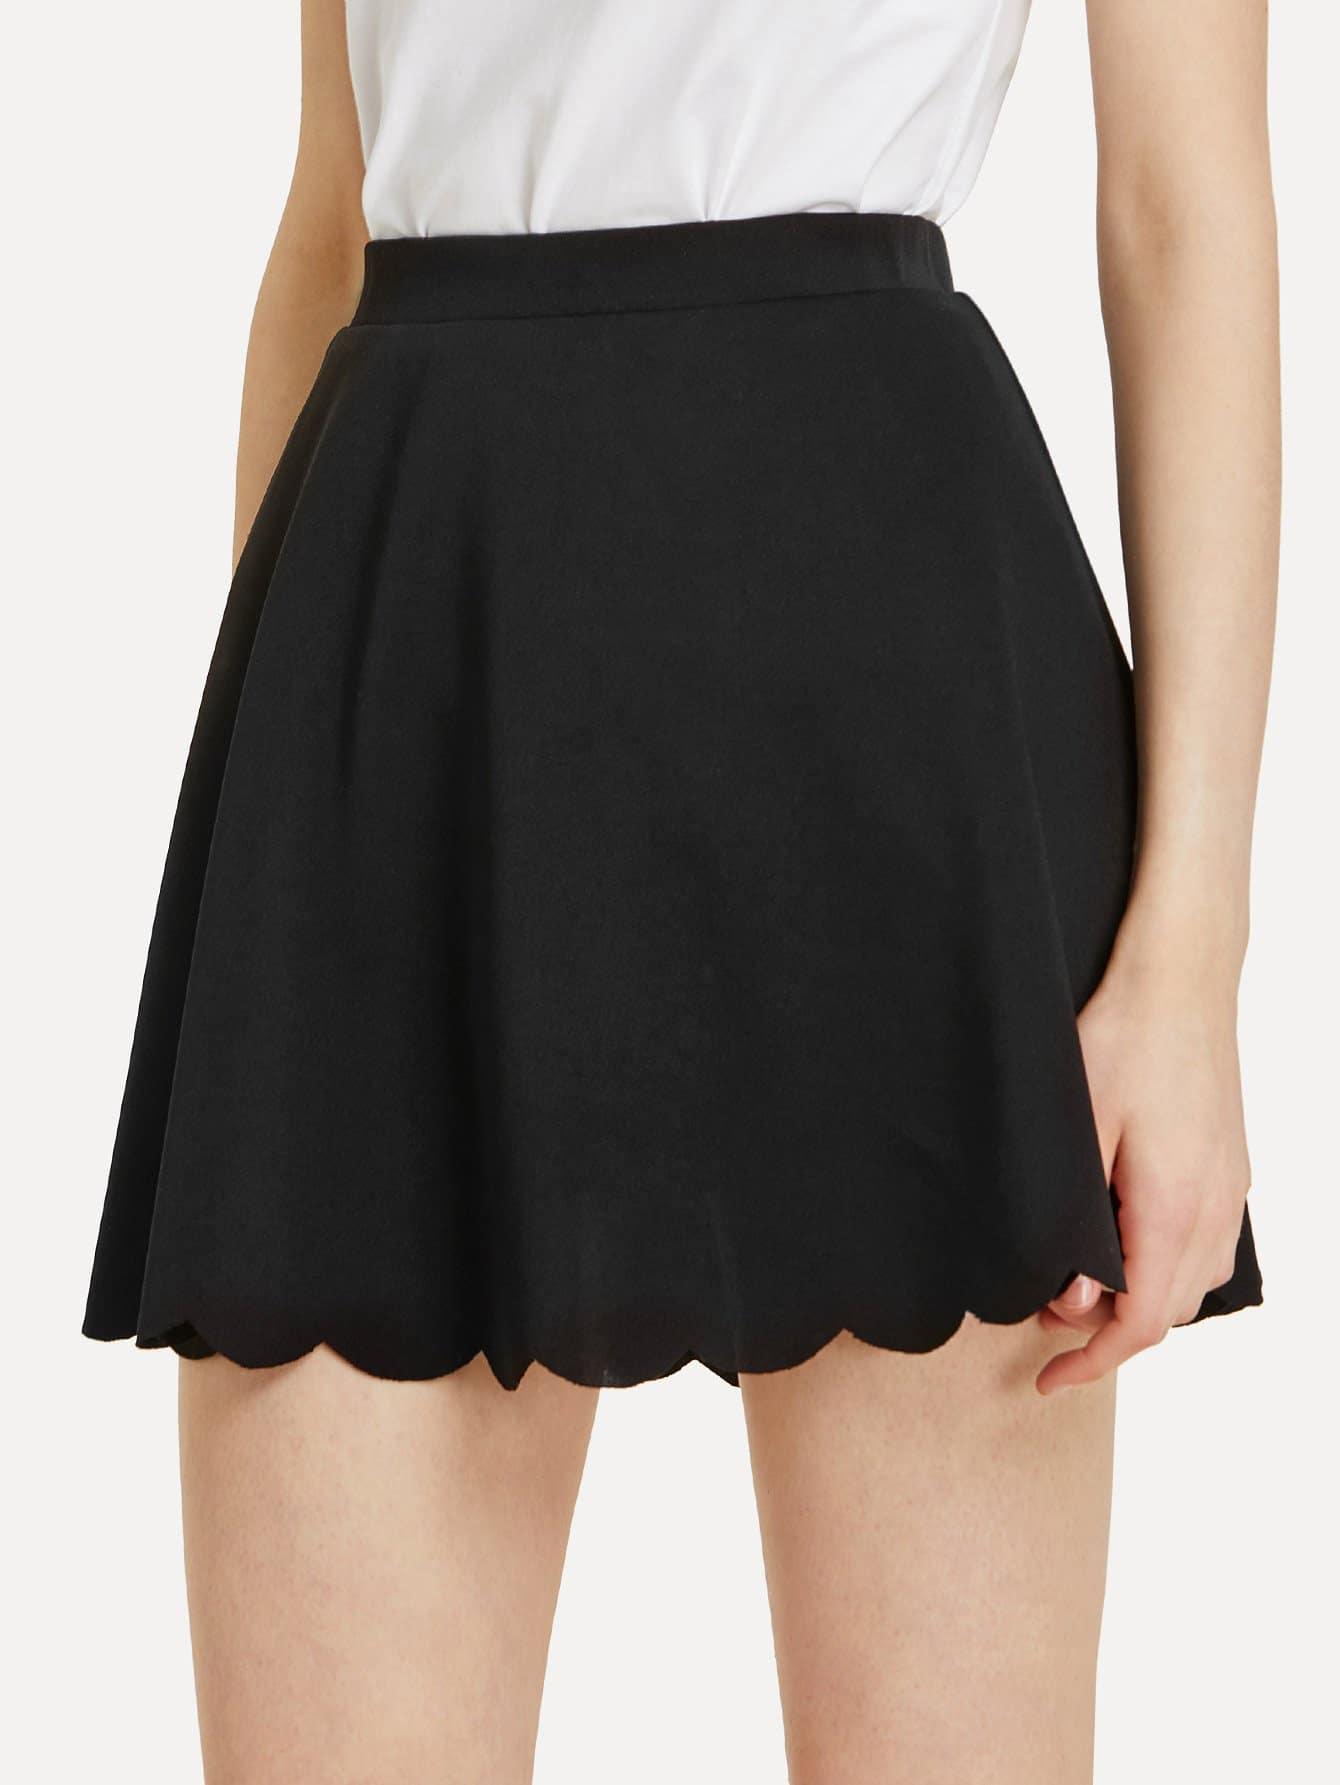 Elastic Waist Scallop Hem Skirt elastic waist scallop ruffle hem pants